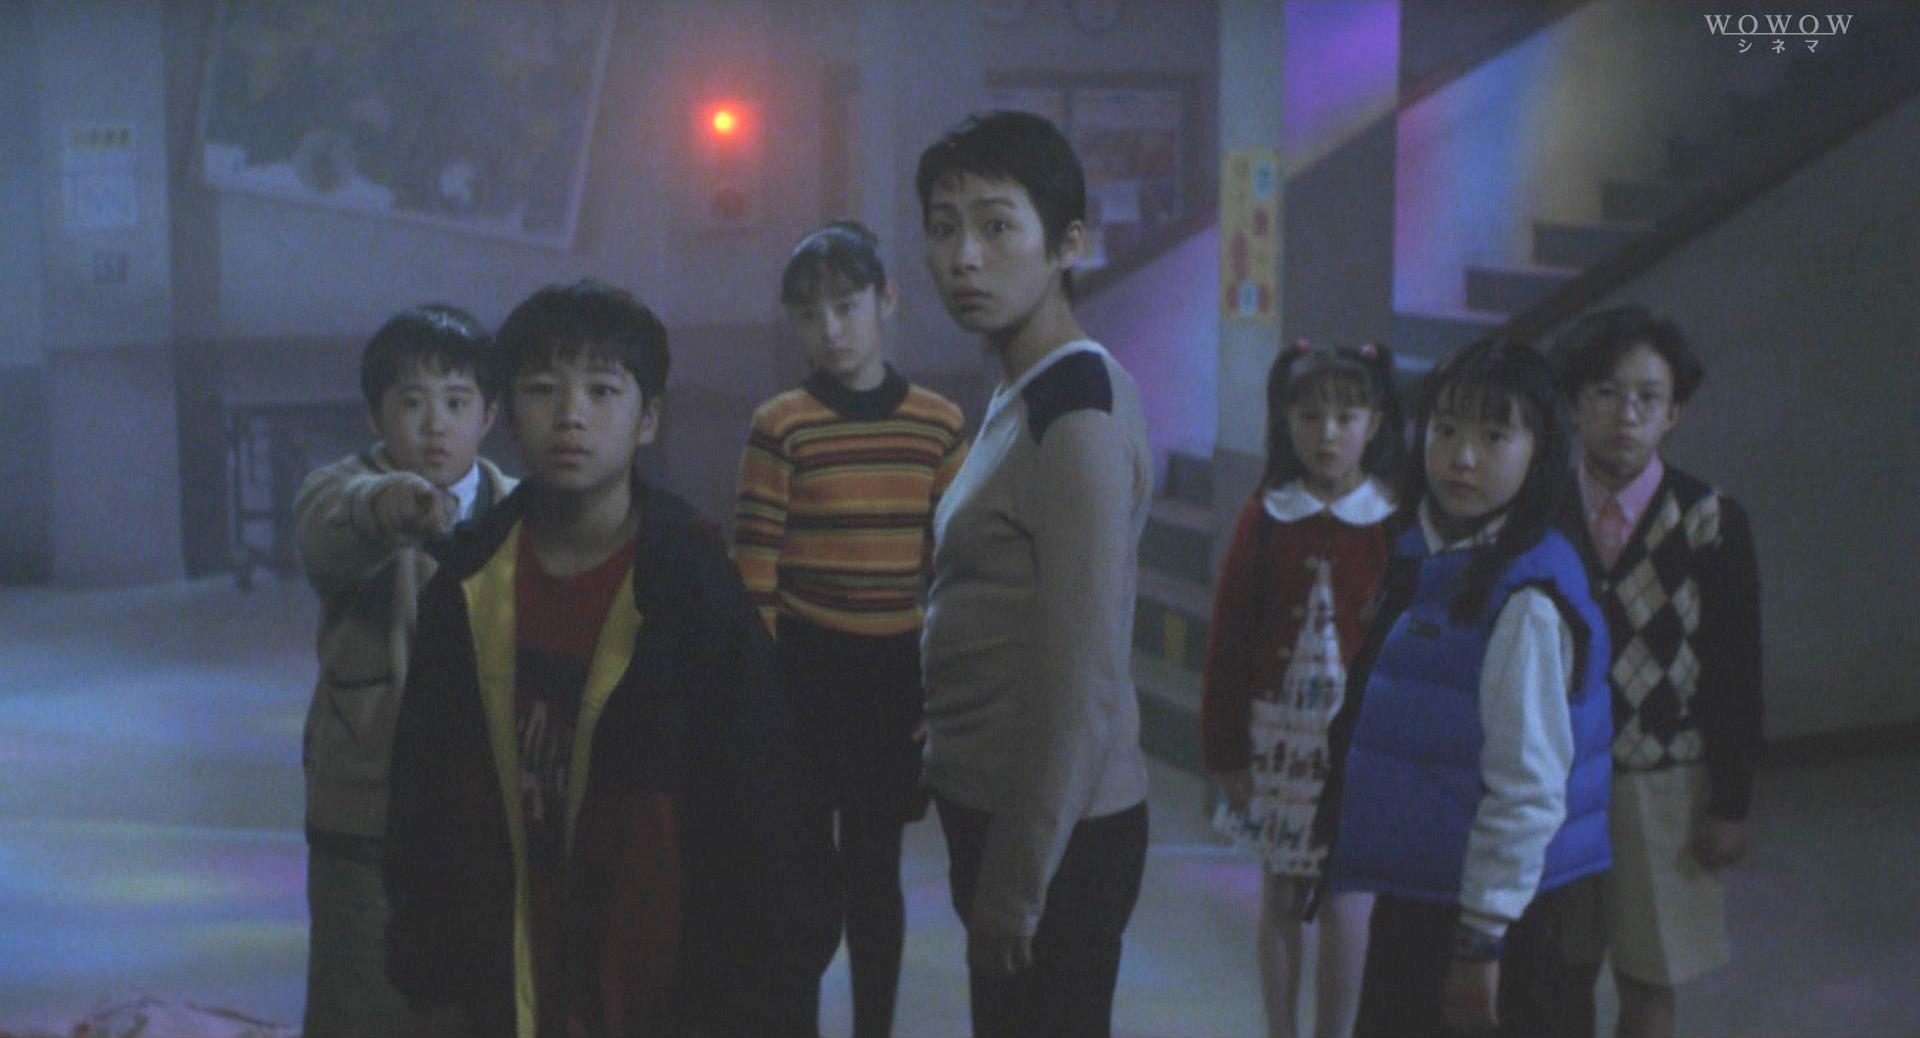 『学校の怪談3』出演者